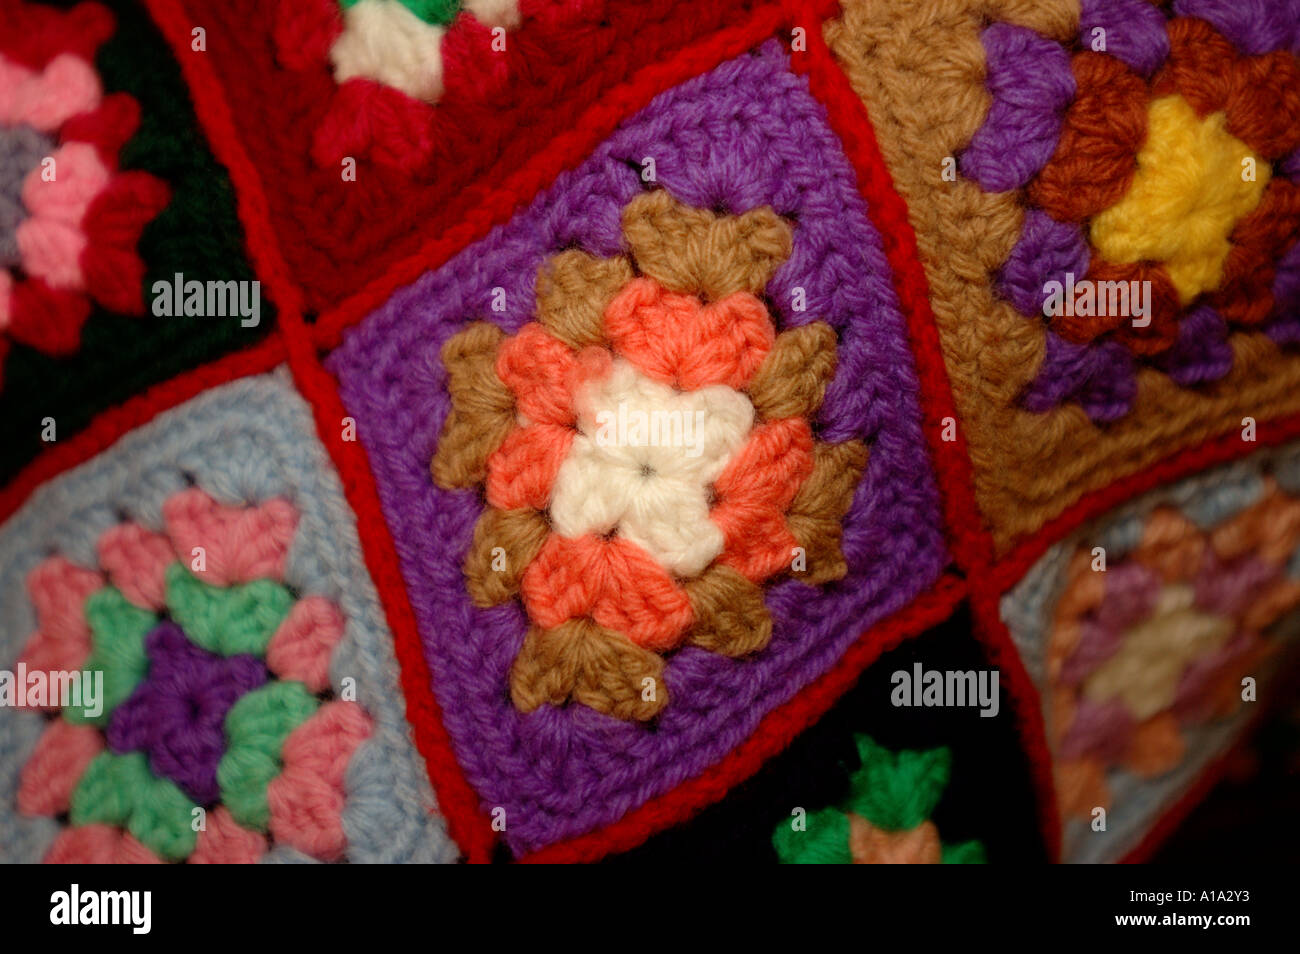 Afghanische Stricken Stricken Nadel Arbeit Hobby Muster Muster rosa ...